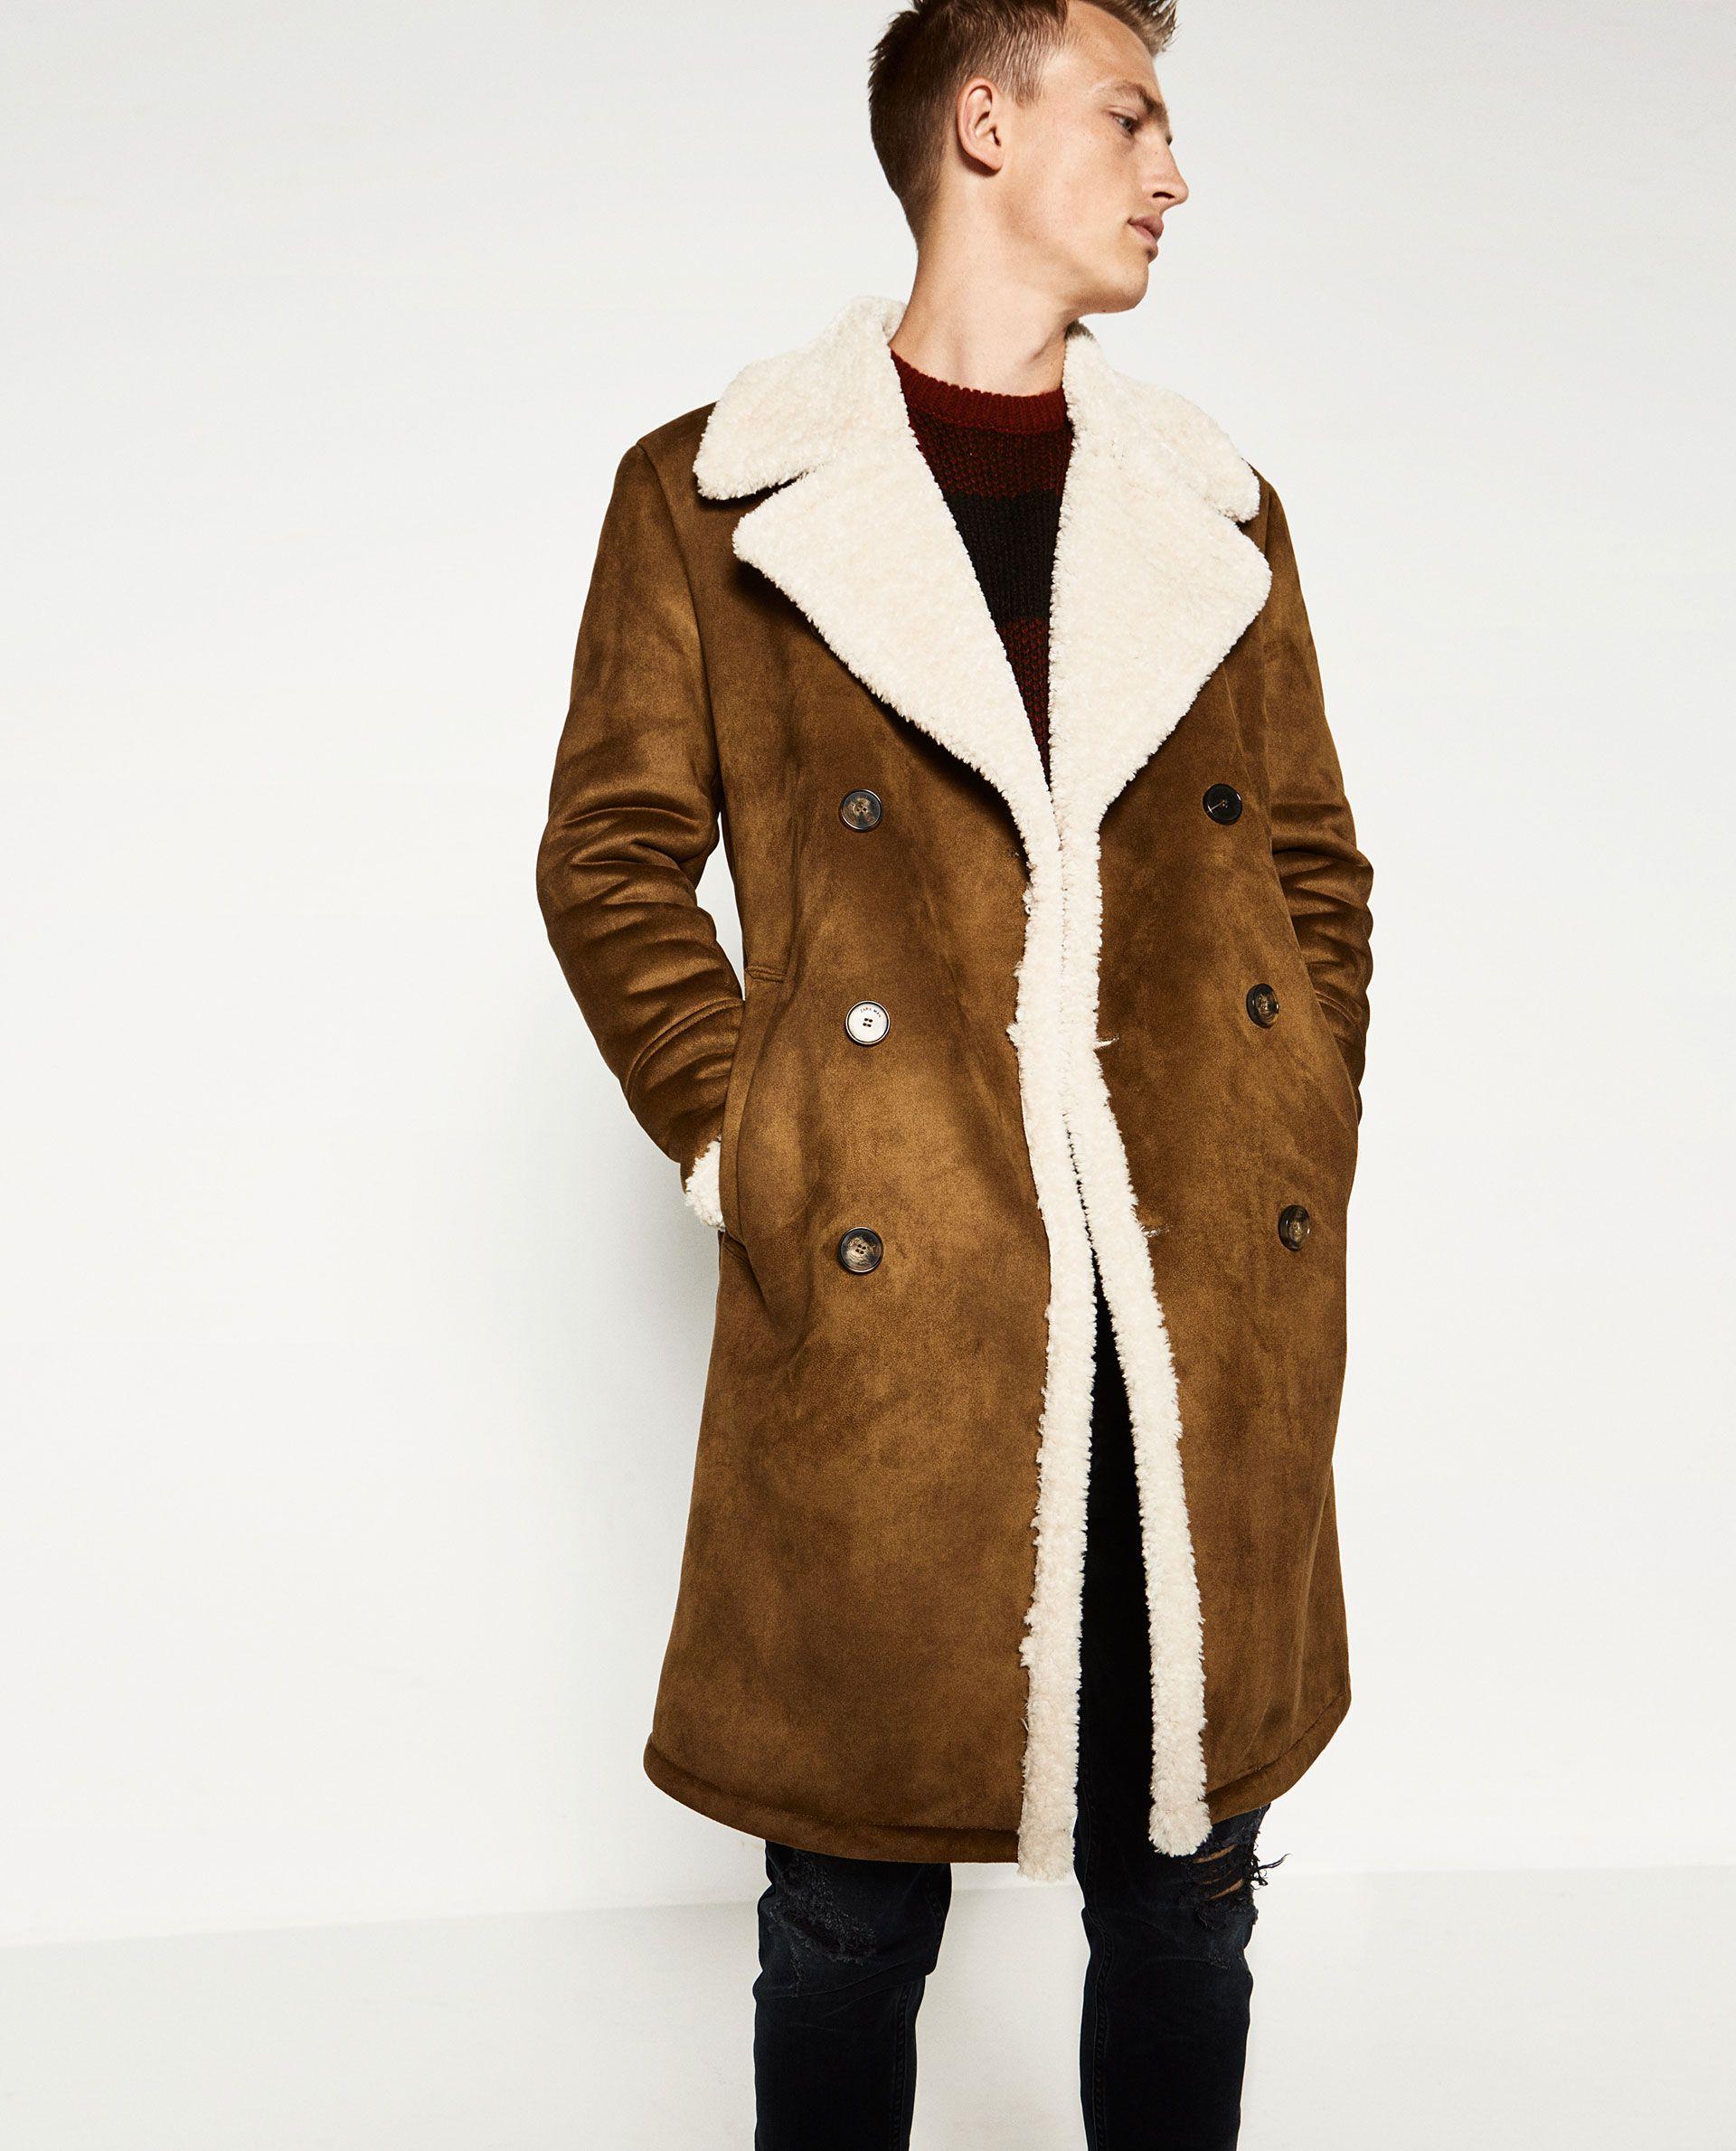 ZARA DoubleFaced Coat Mens shearling coat, Custom